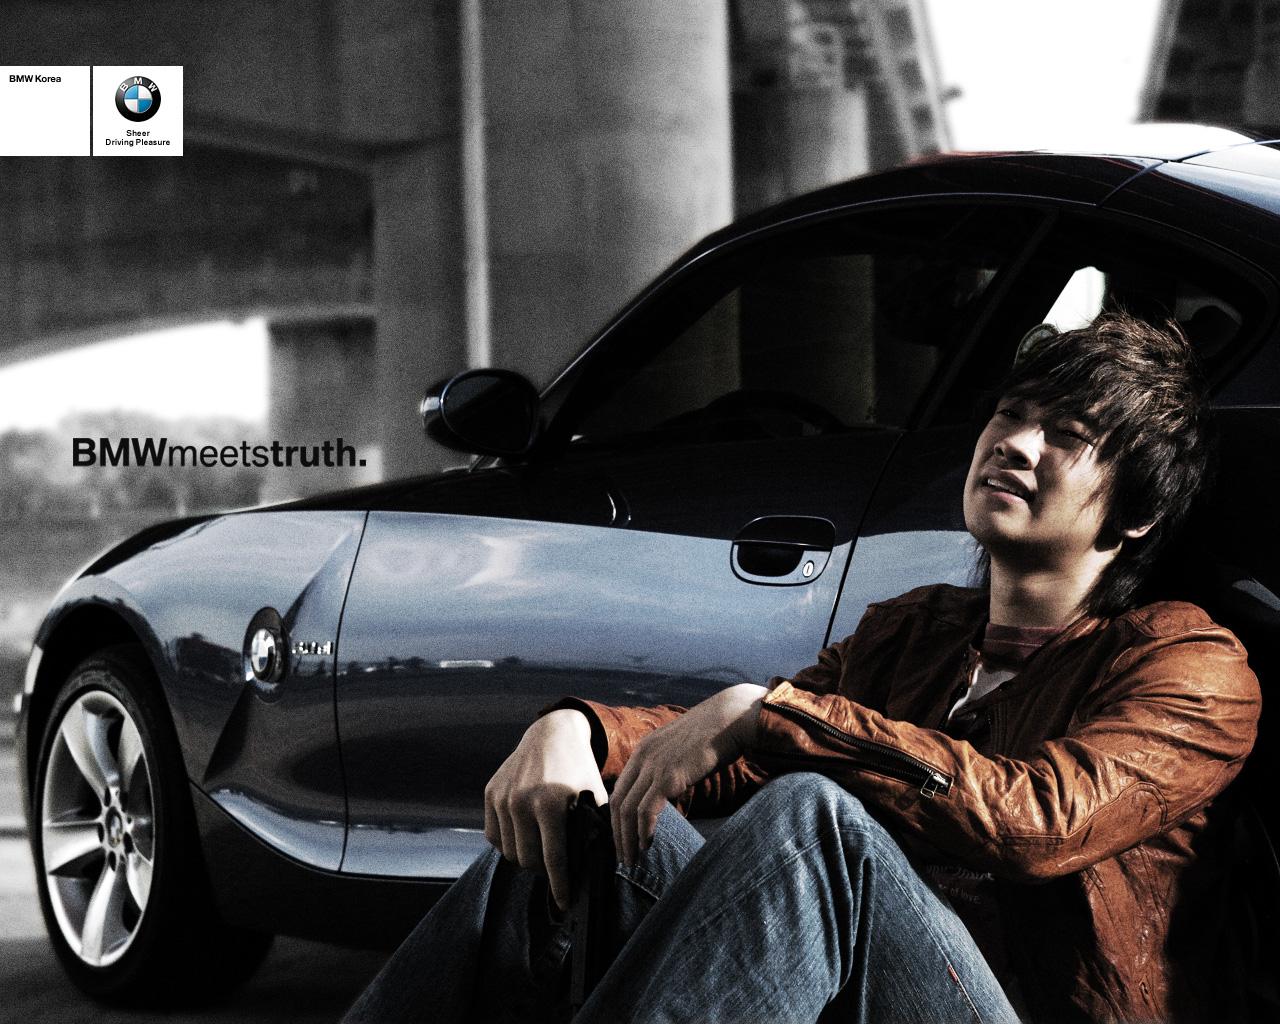 Rain - BMW Meets Truth _c0047605_0335277.jpg